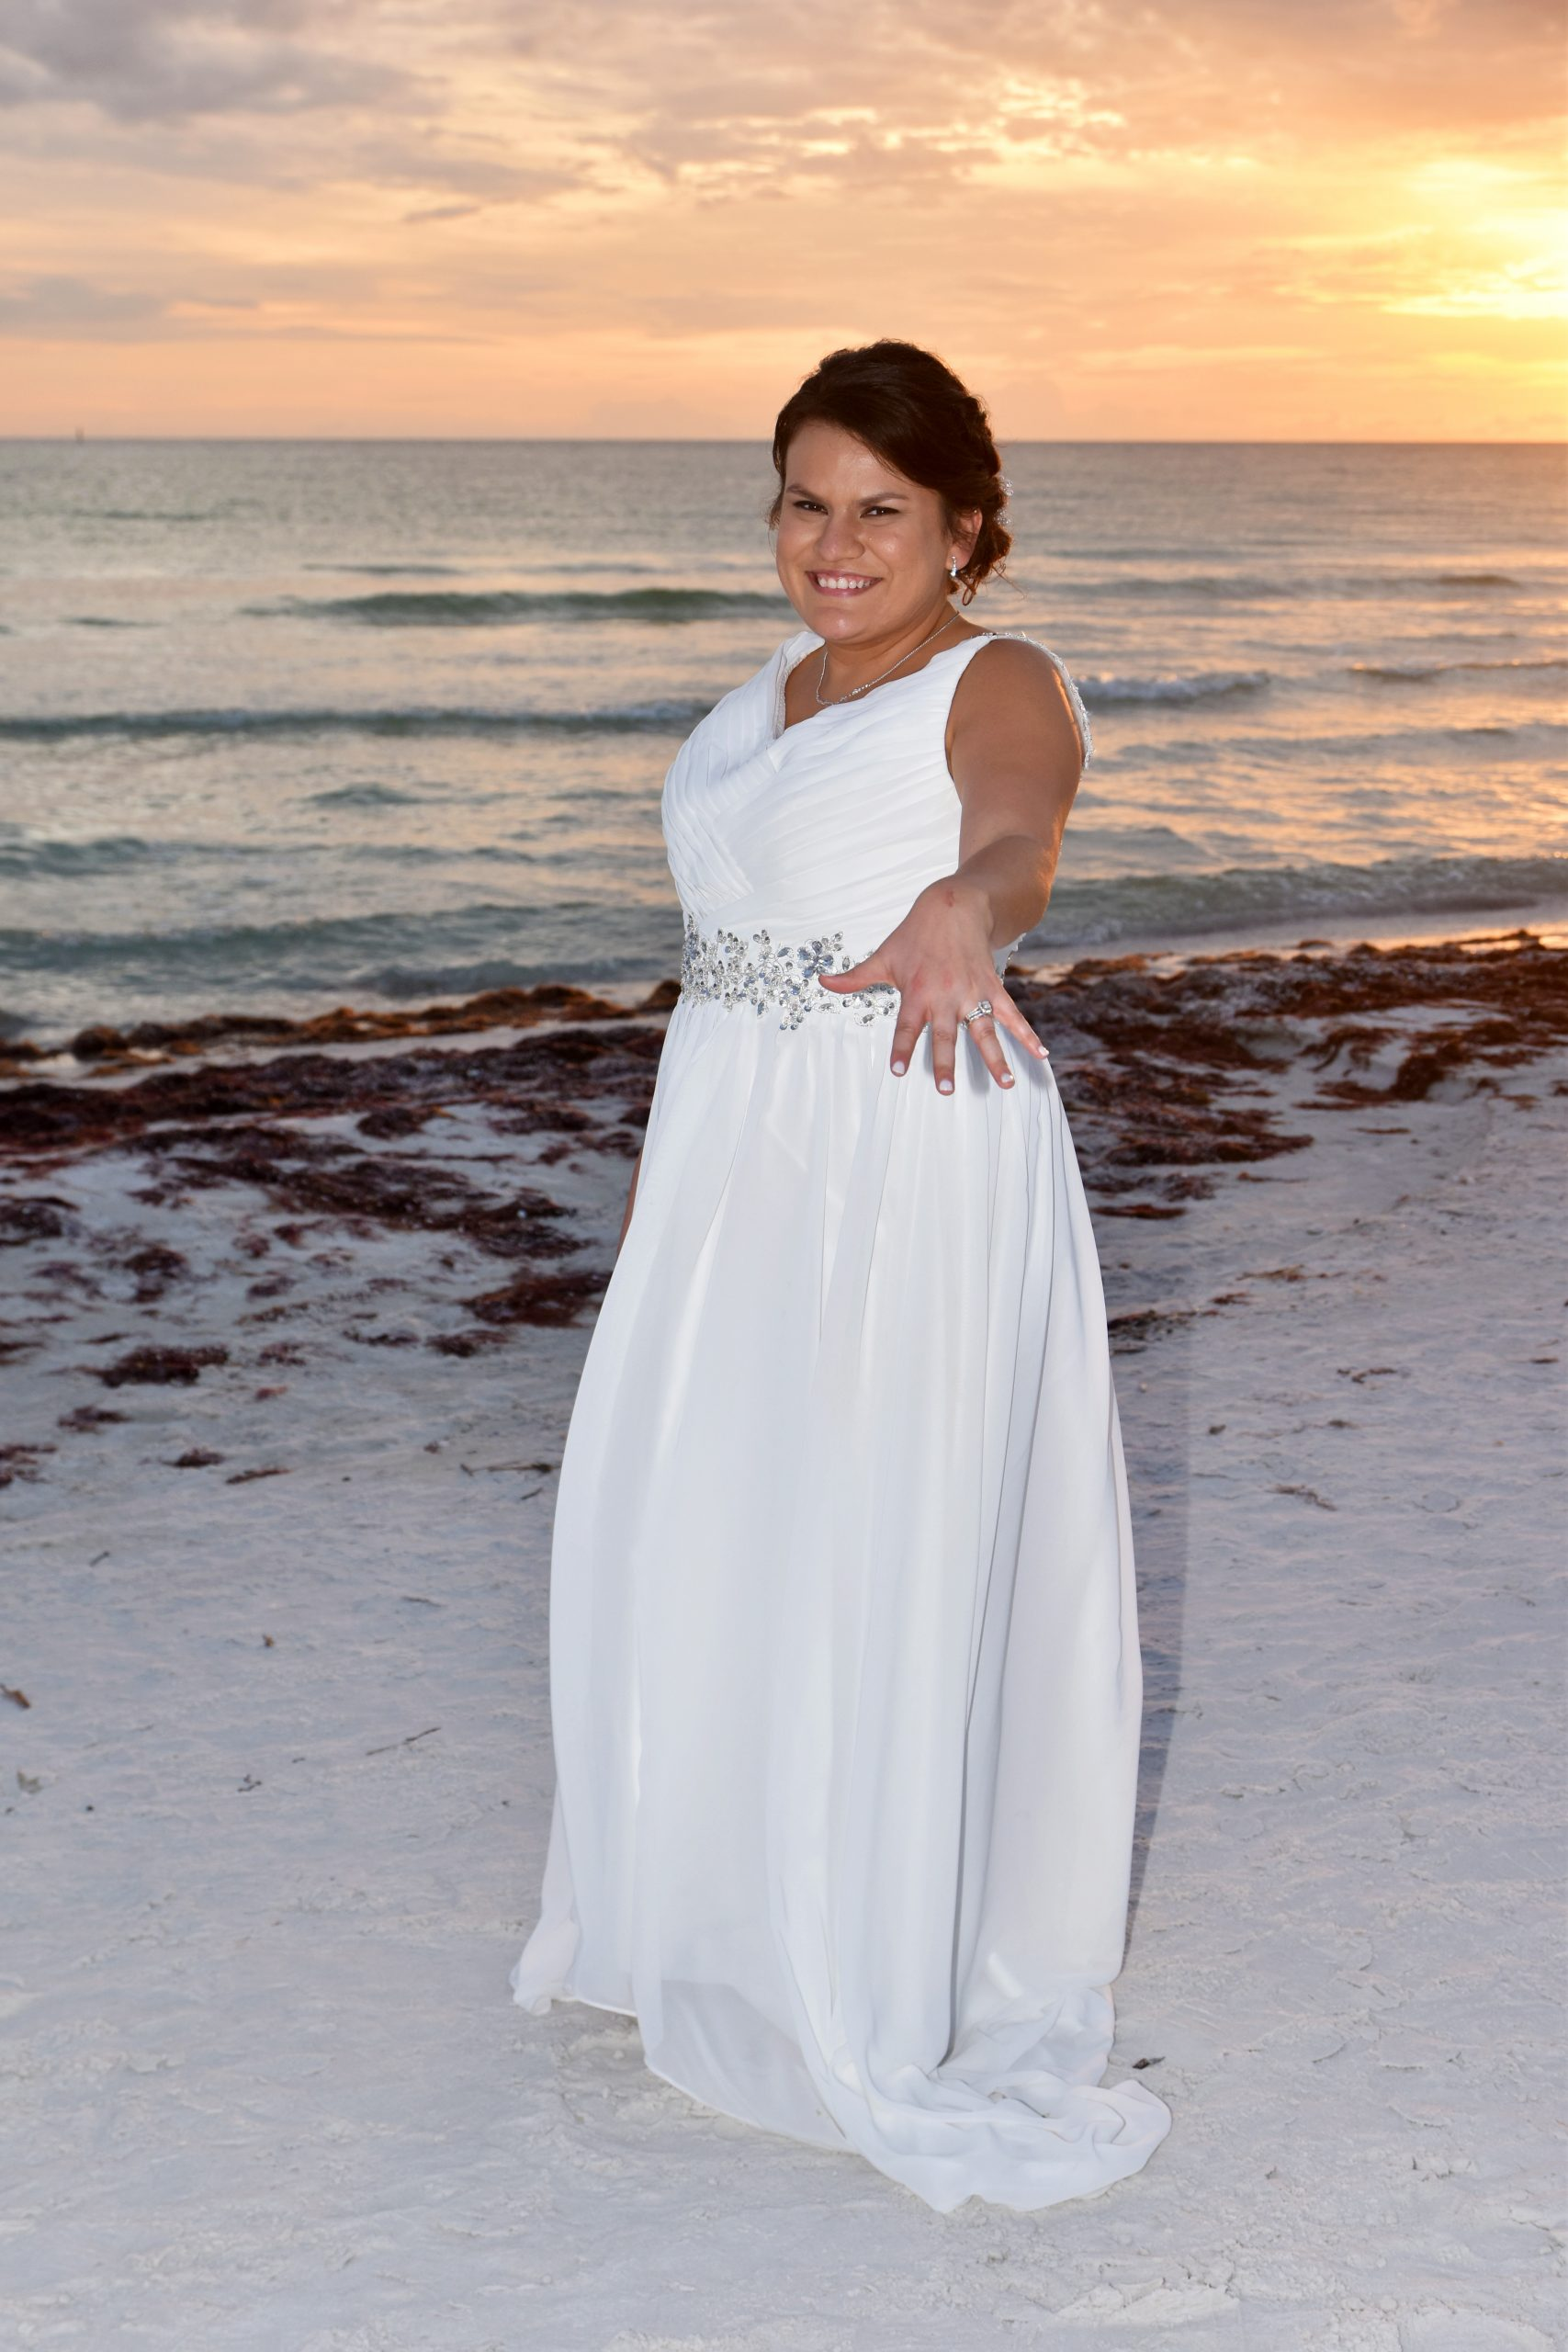 Best Beach Wedding Jewelry Ideas Real Brides Pose Florida Beach Weddings